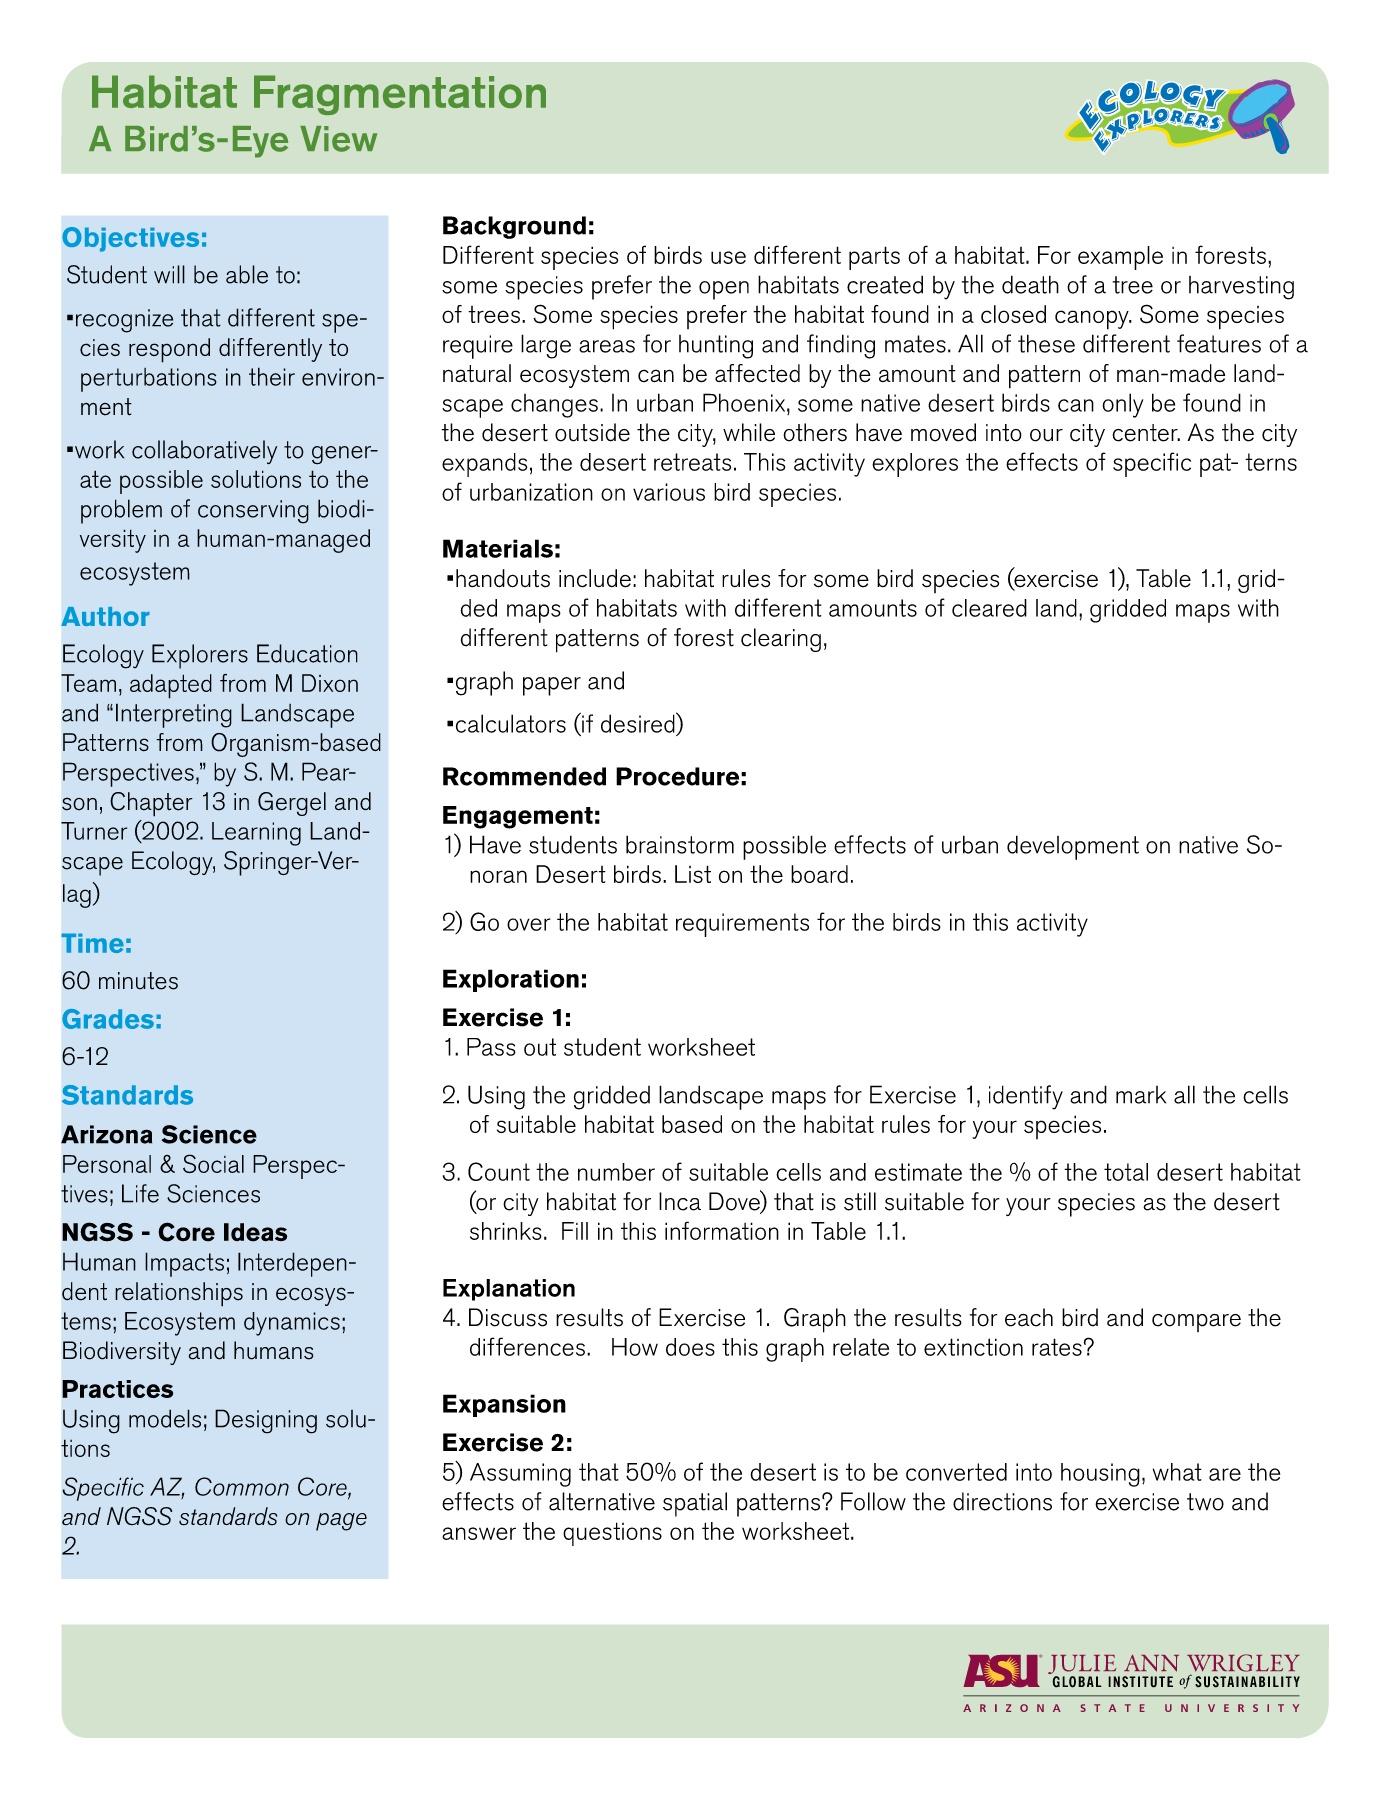 hight resolution of Habitat-Fragmentation-A-Birds-Eye-View-Flip eBook Pages 1 - 7  AnyFlip    AnyFlip